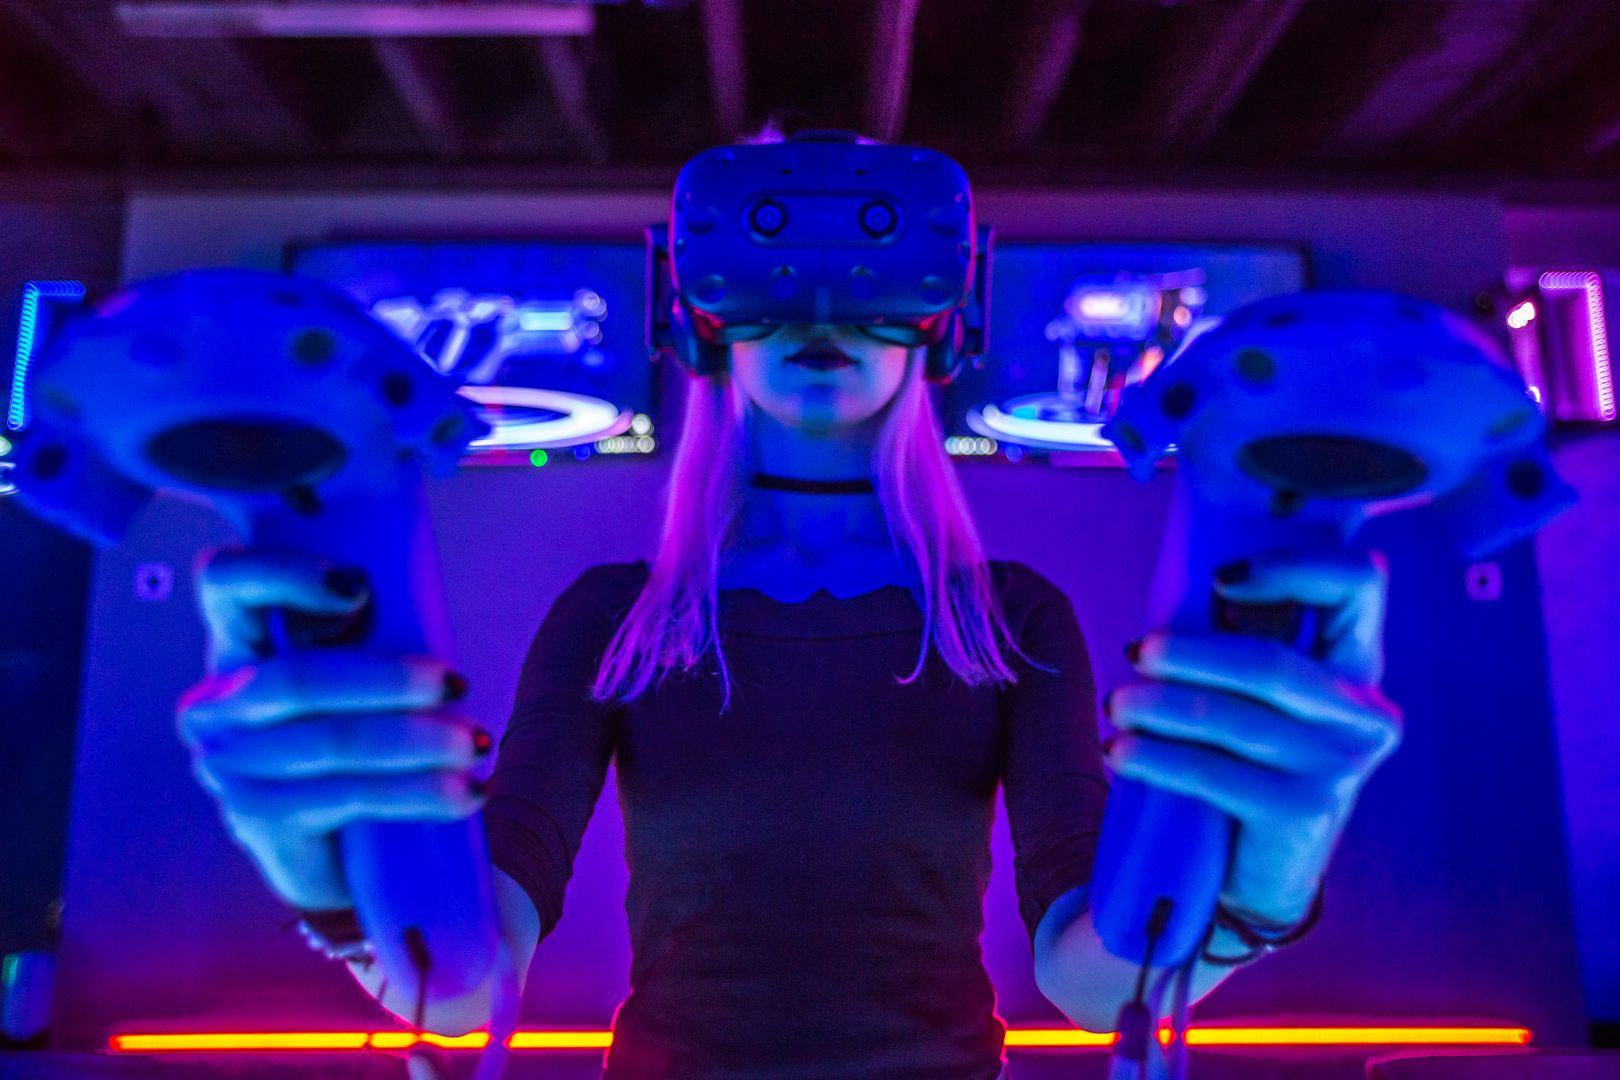 VR-girl-Virtual-Reality